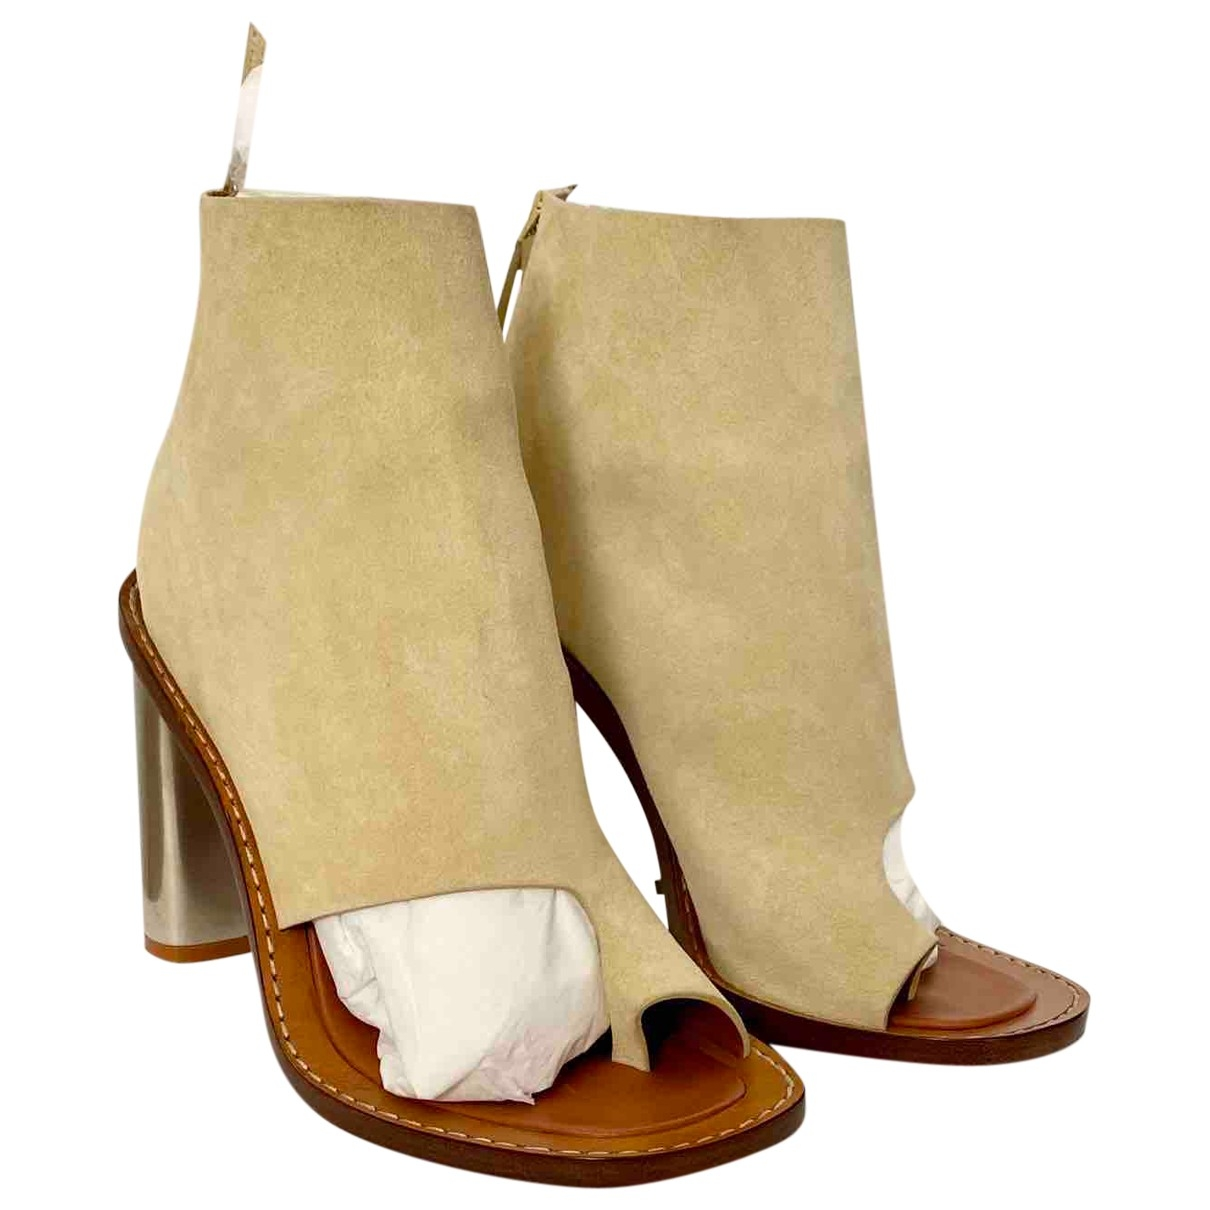 Celine Bam Bam Beige Leather Sandals for Women 38 EU